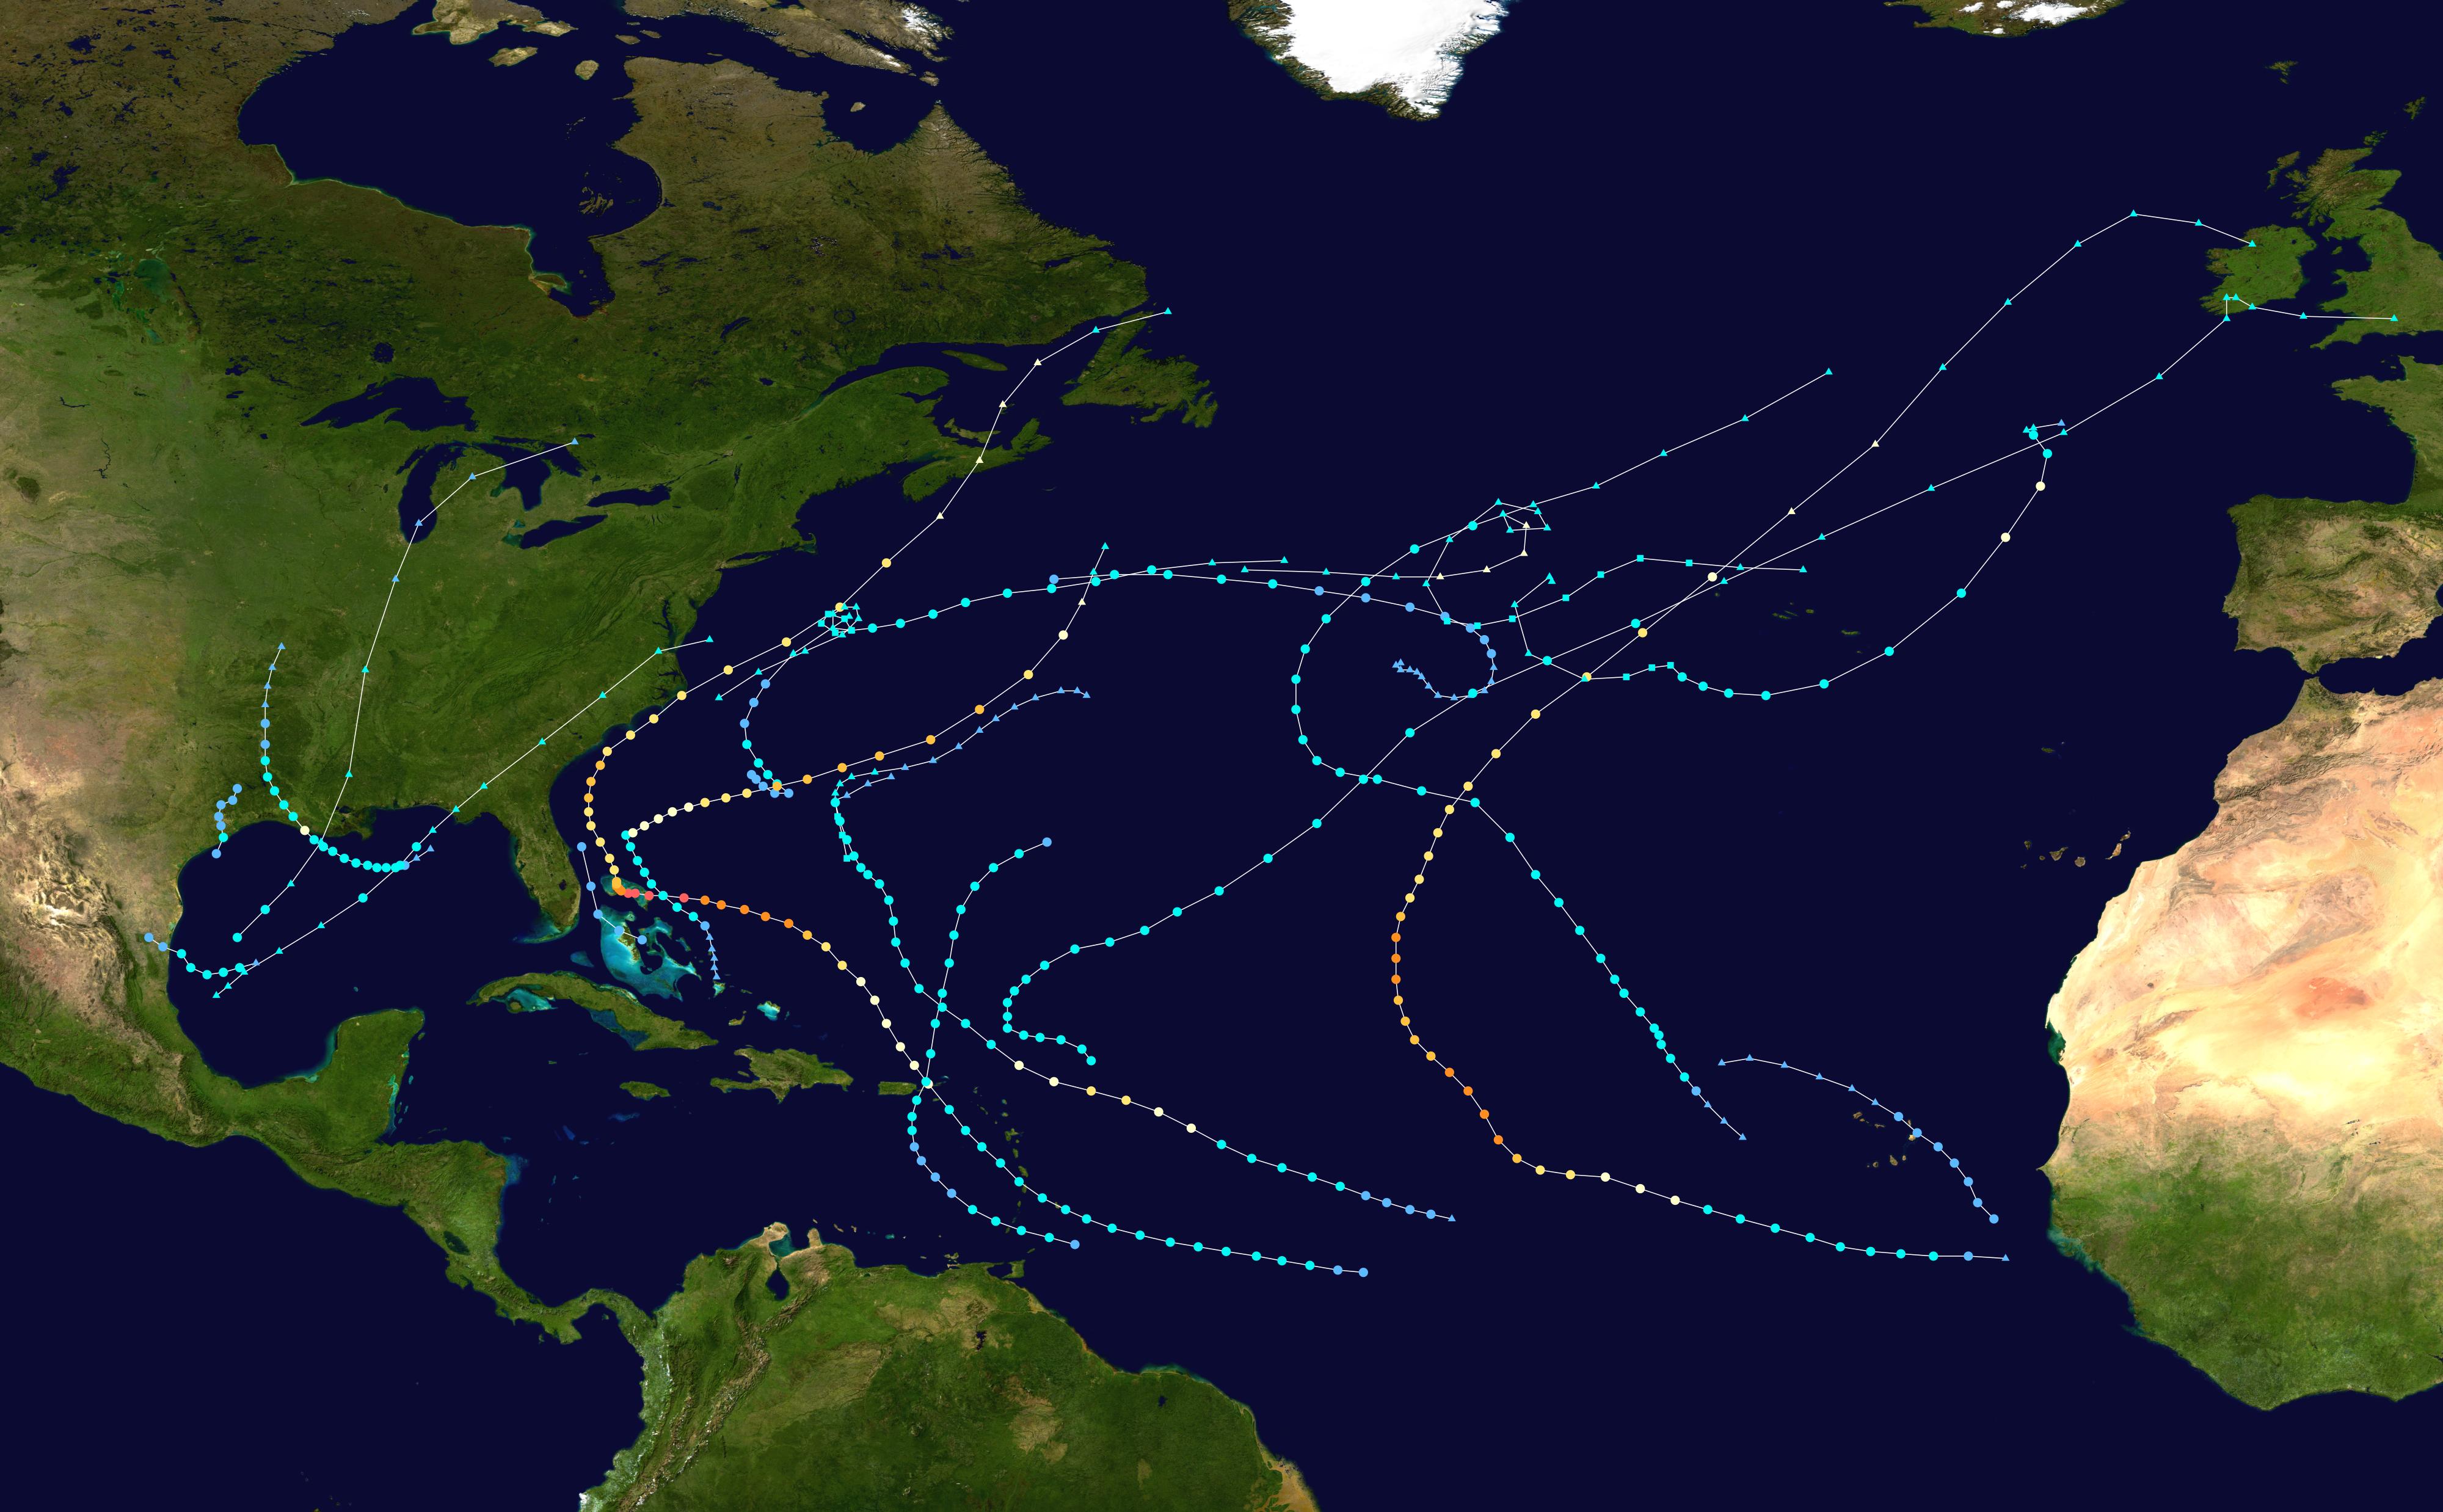 2019 Atlantic hurricane season - Wikipedia